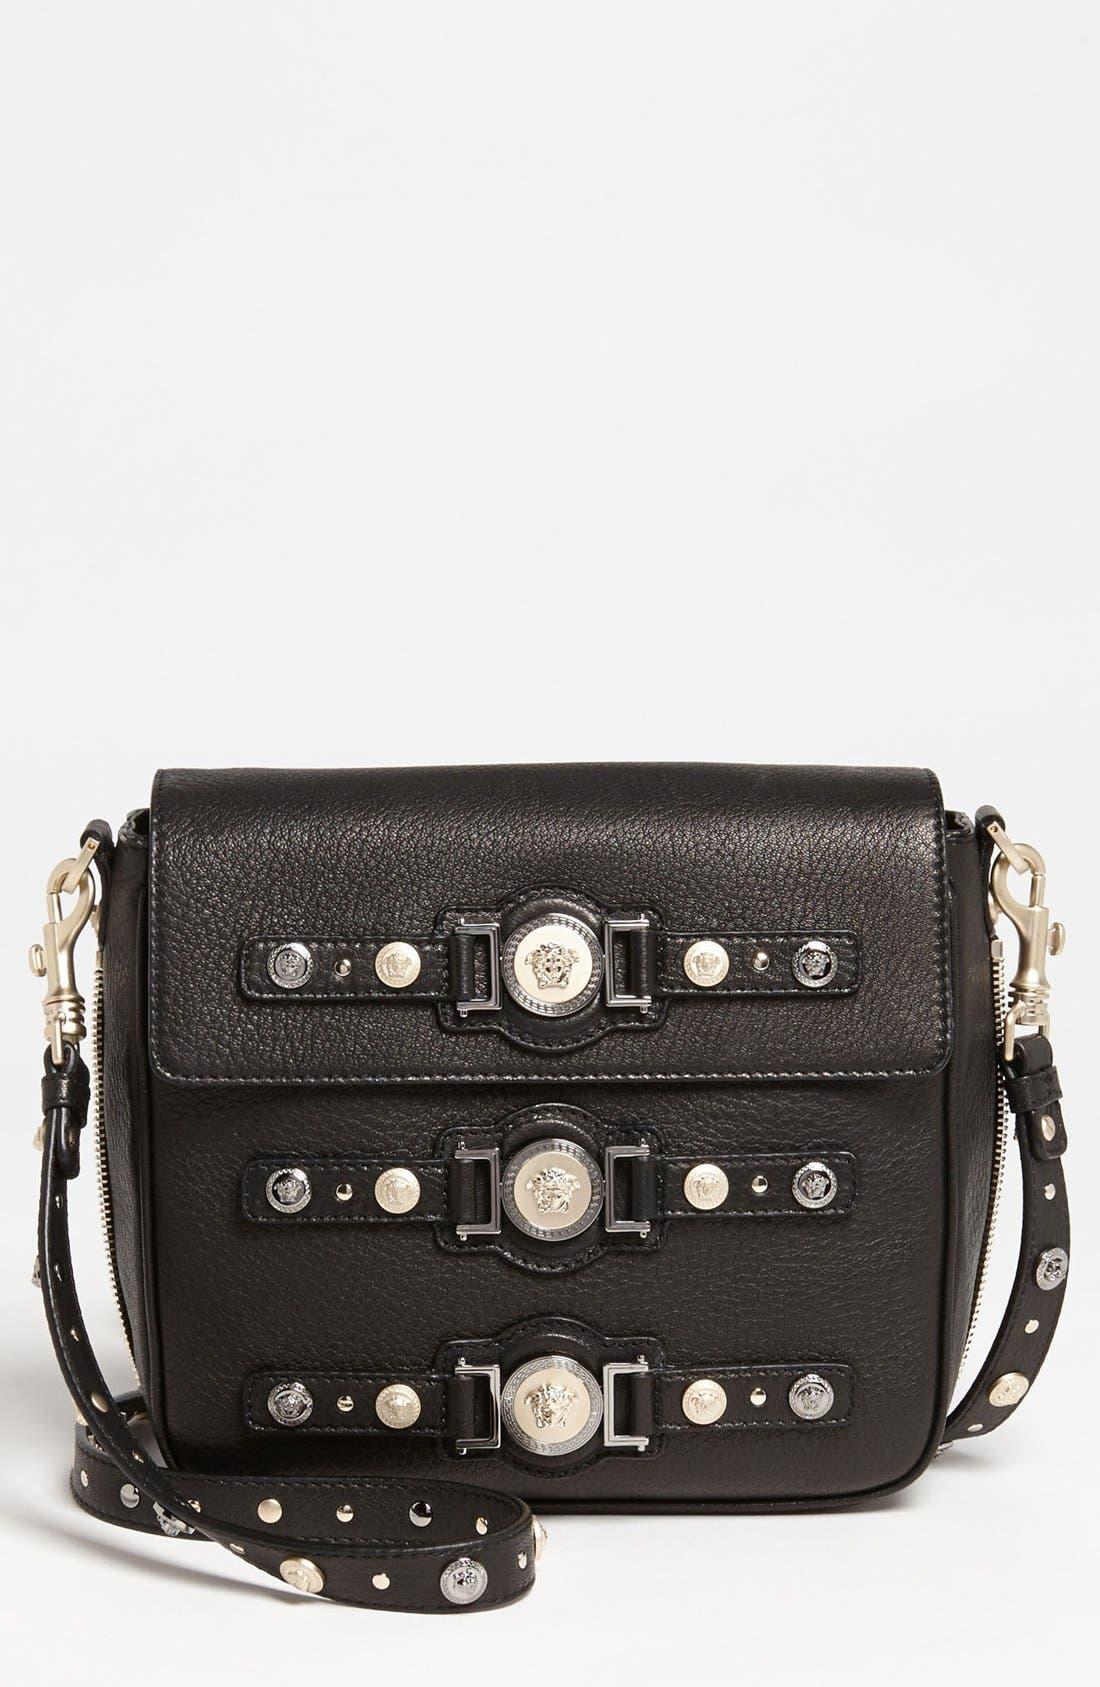 Main Image - Versace 'Classic - Triple Medusa' Leather Crossbody Bag